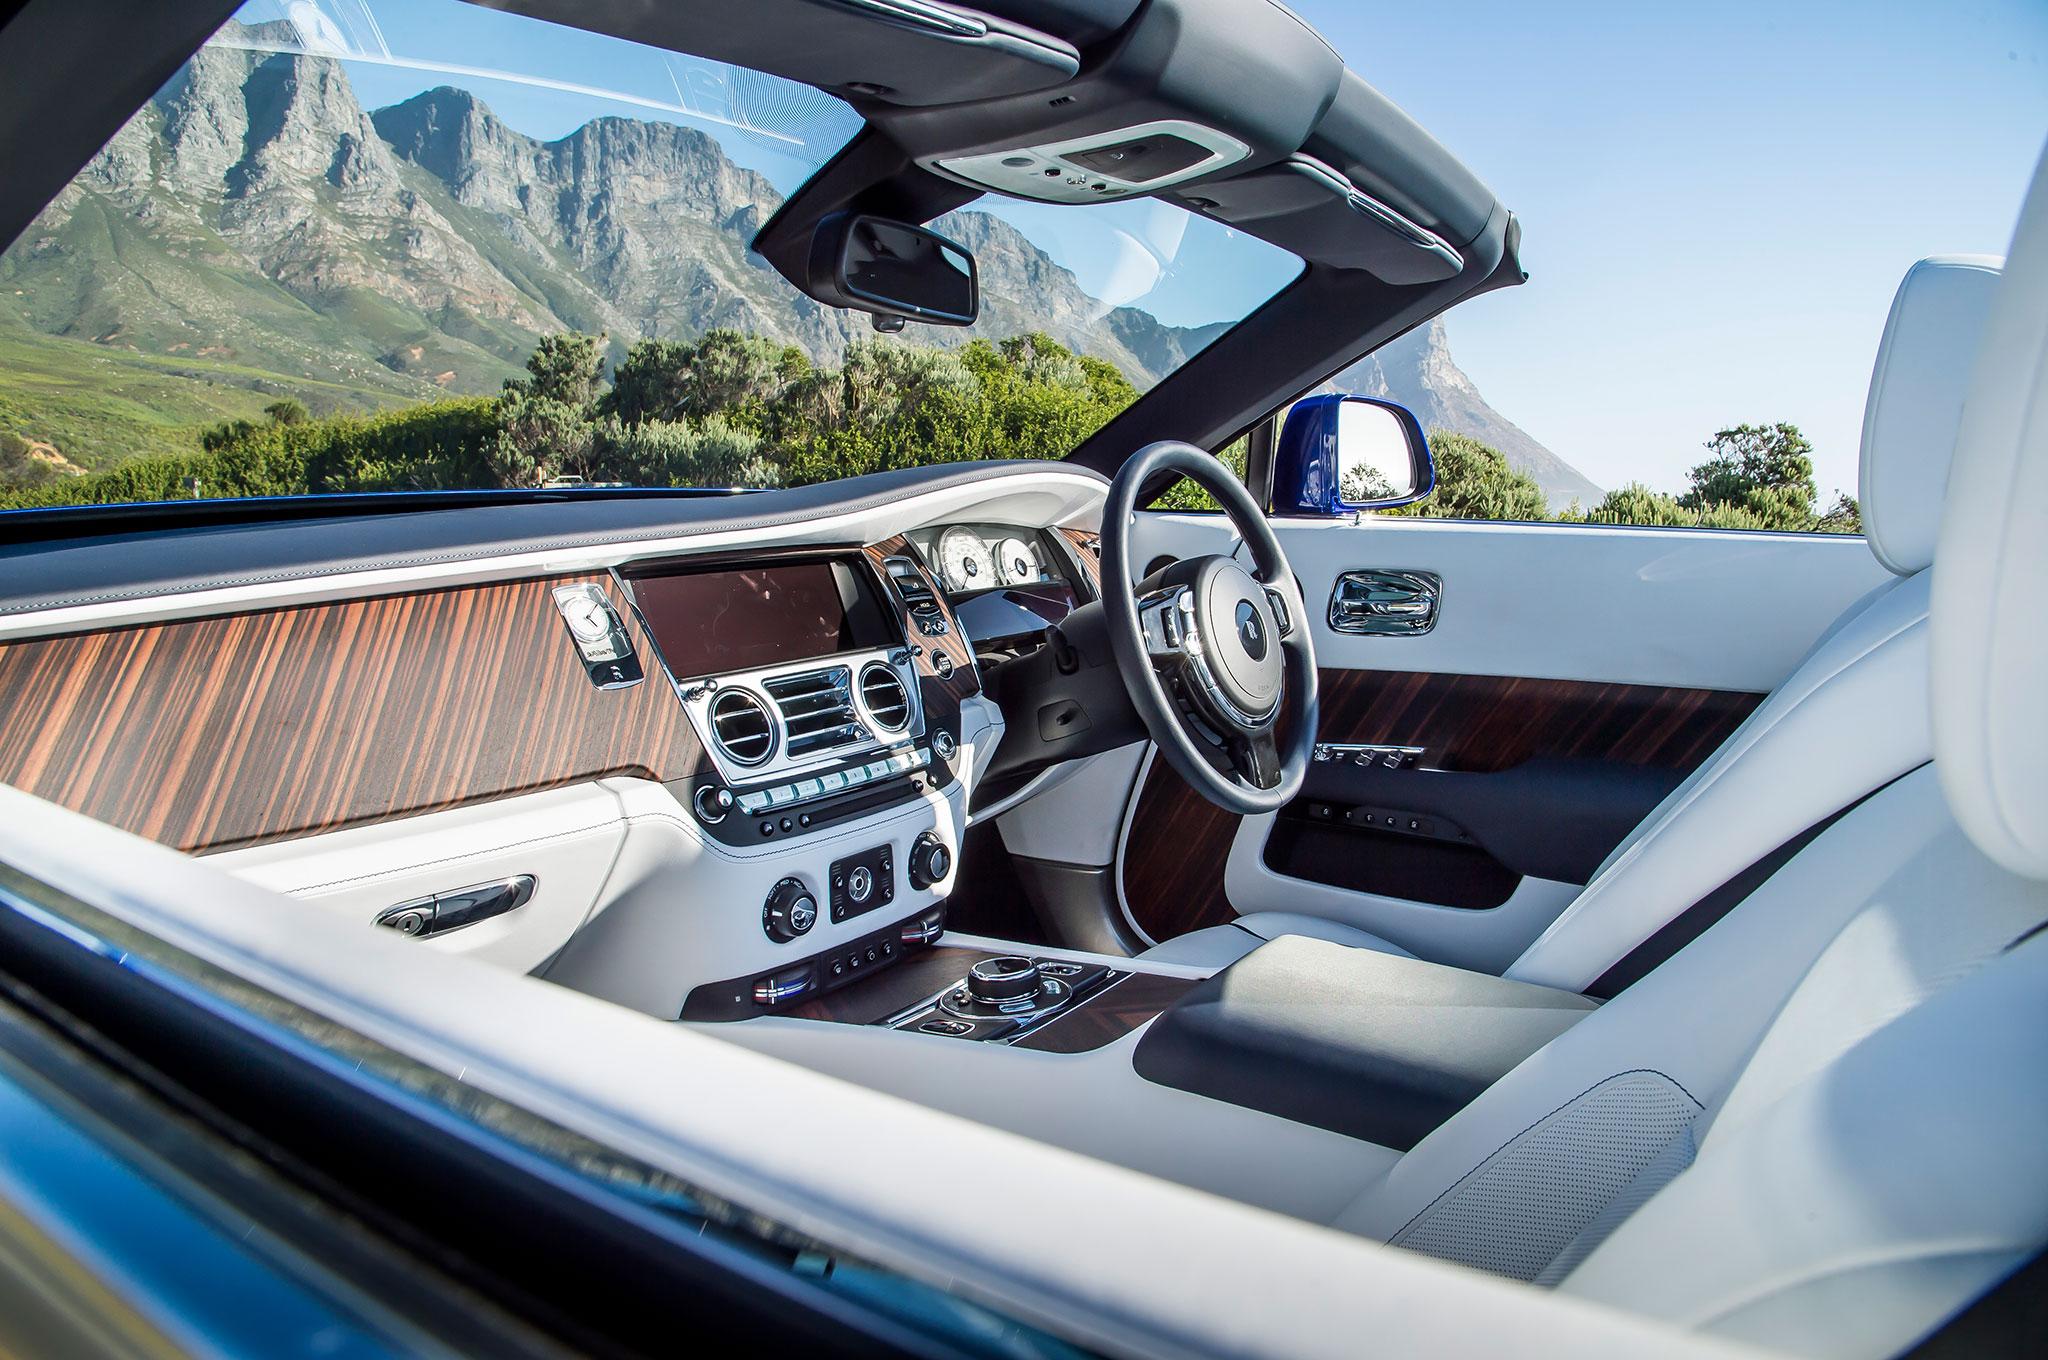 2016-Rolls-Royce-Dawn-cabin-02.jpg